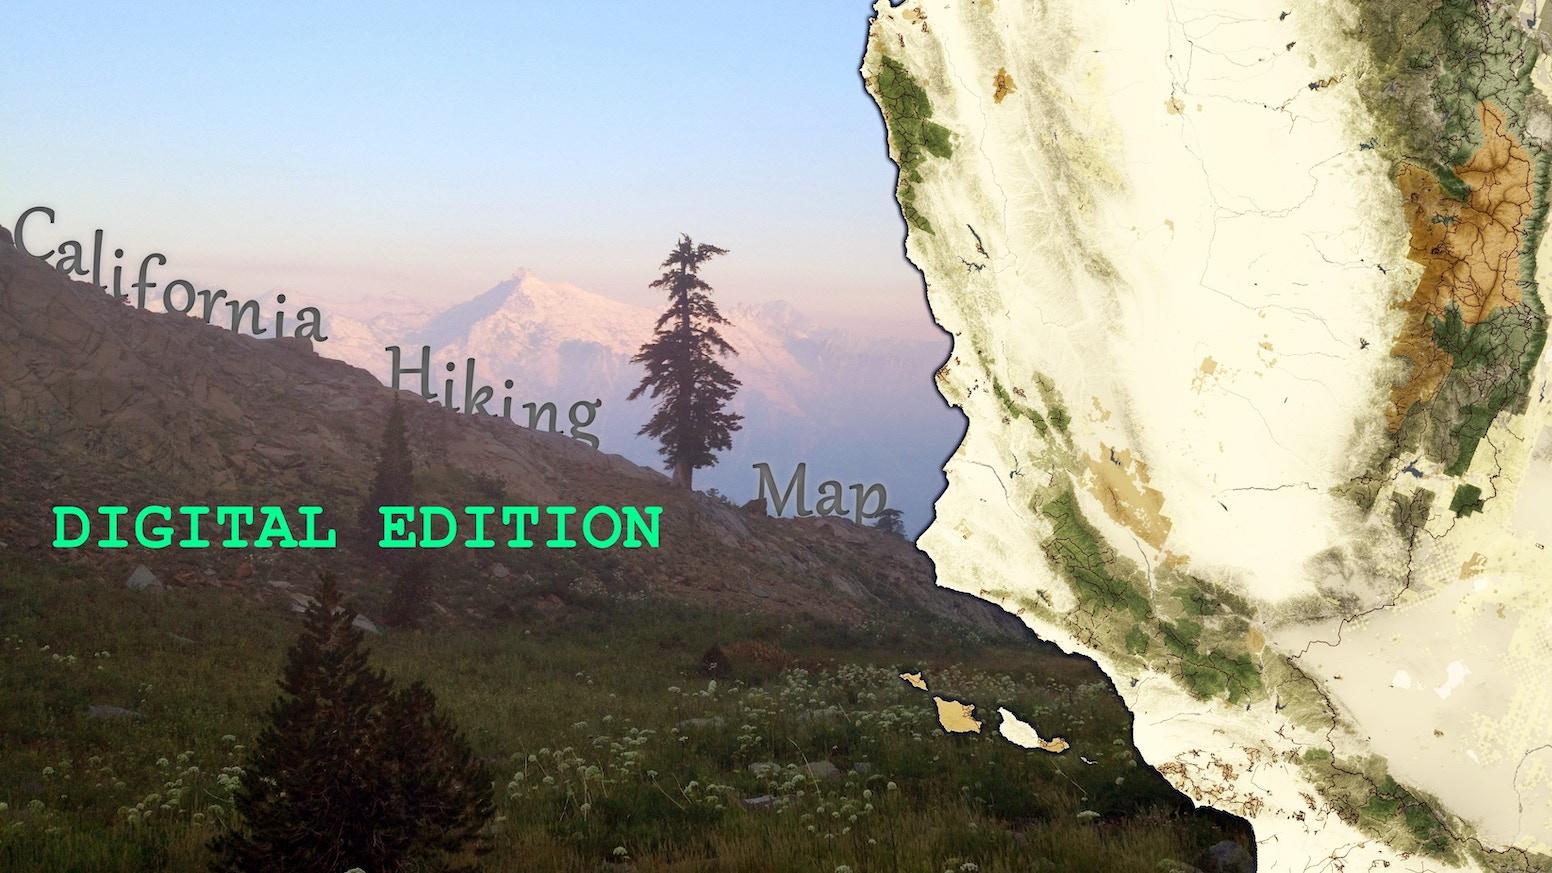 The California Hiking Map  Digital Edition by Jason Mandly